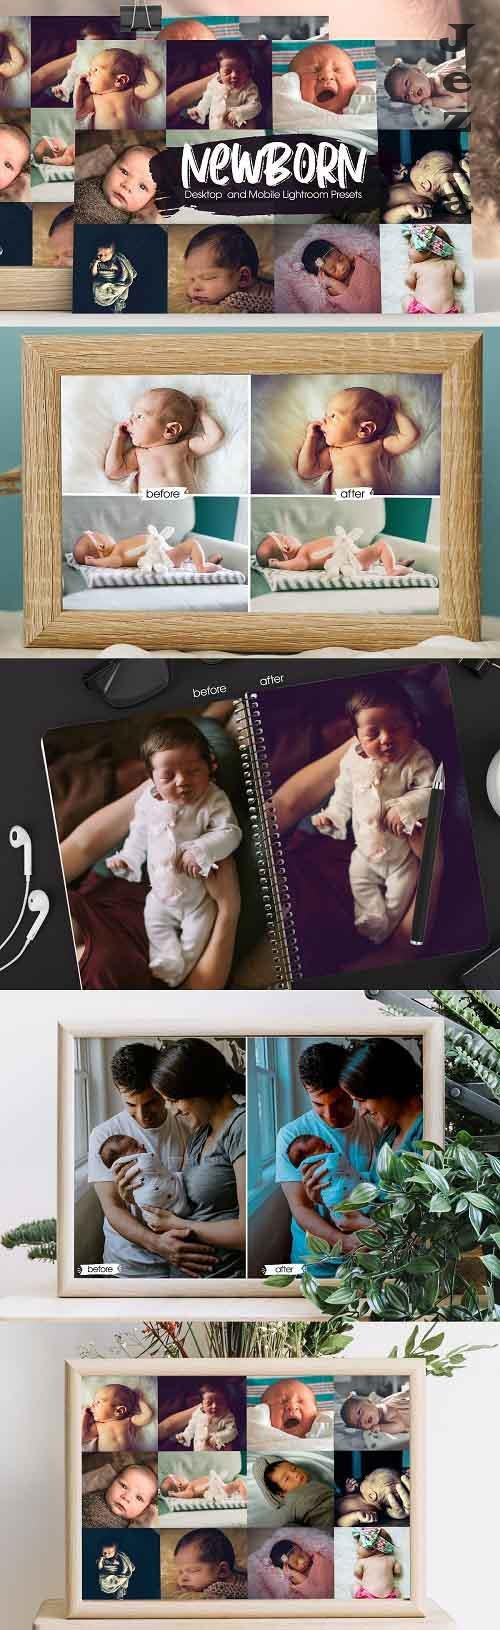 Newborn Lightroom Presets - 5370188